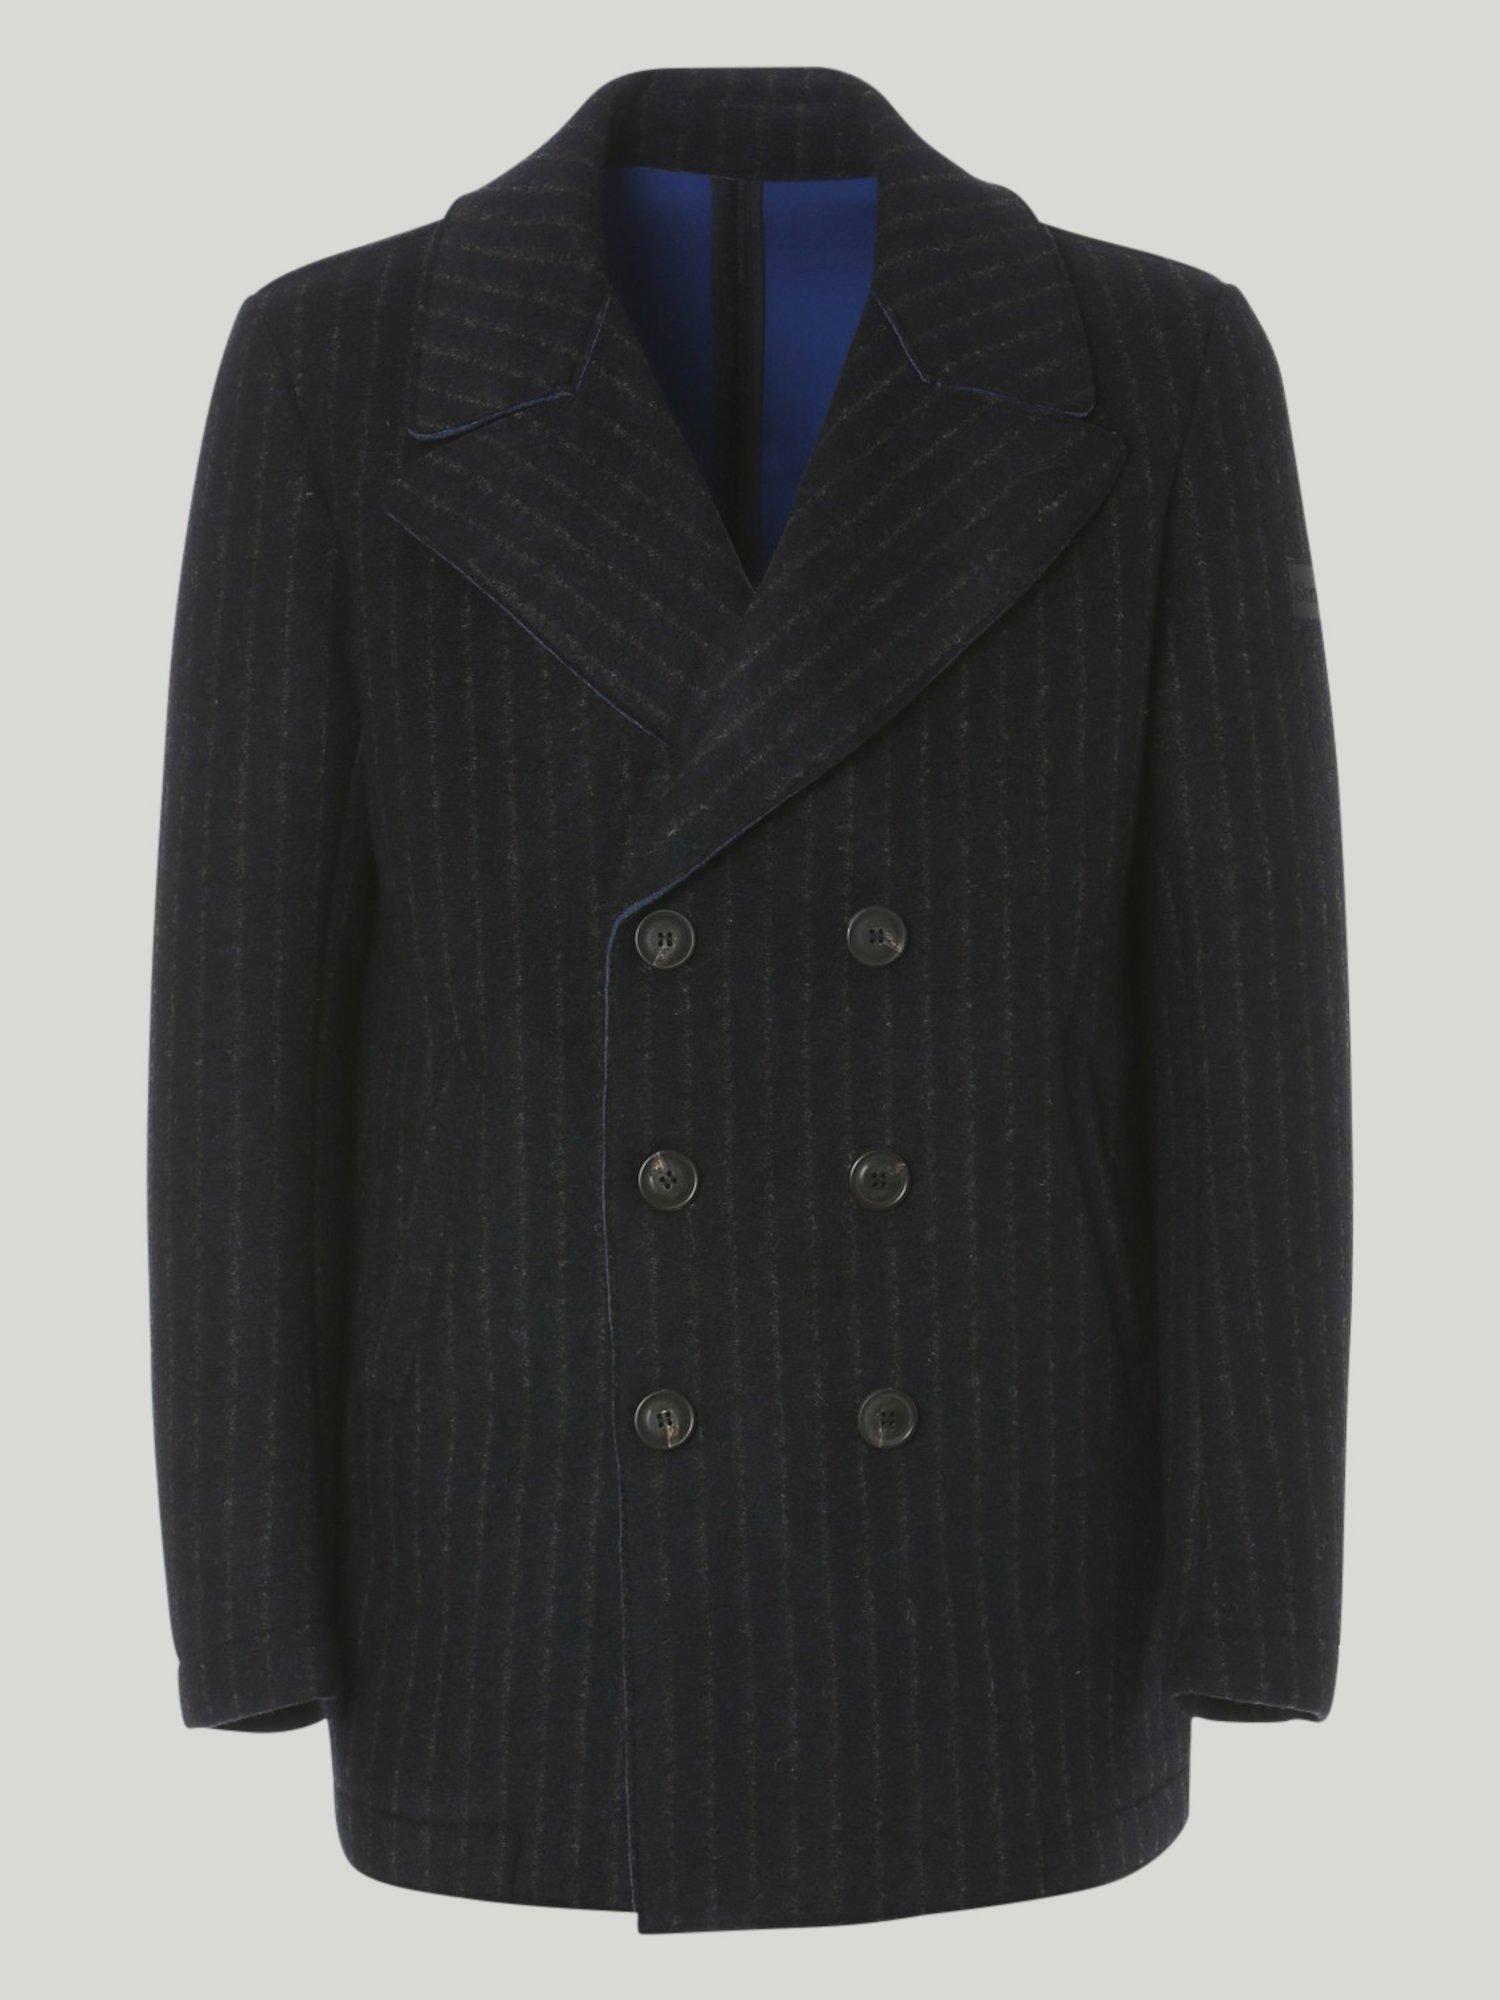 Bollard jacket - Navy